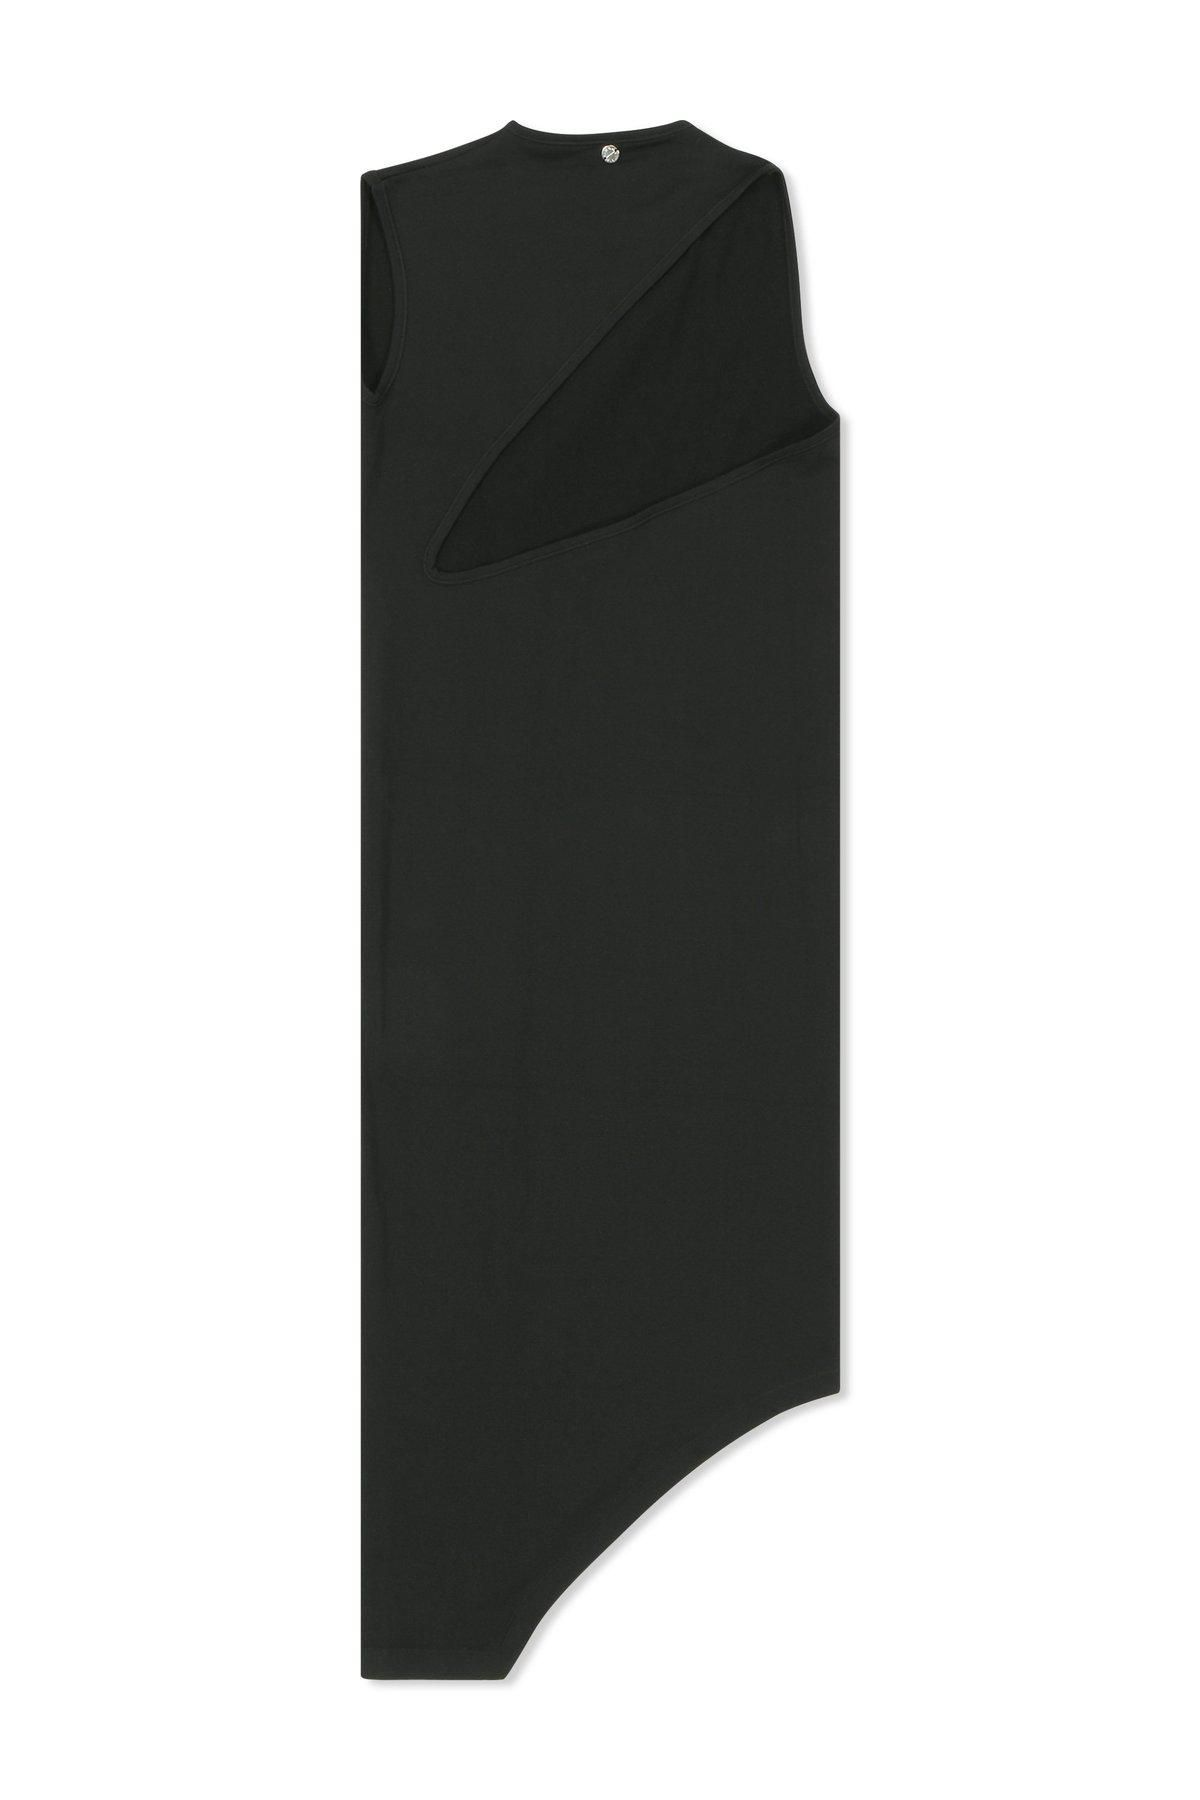 simon miller stretch pica dress